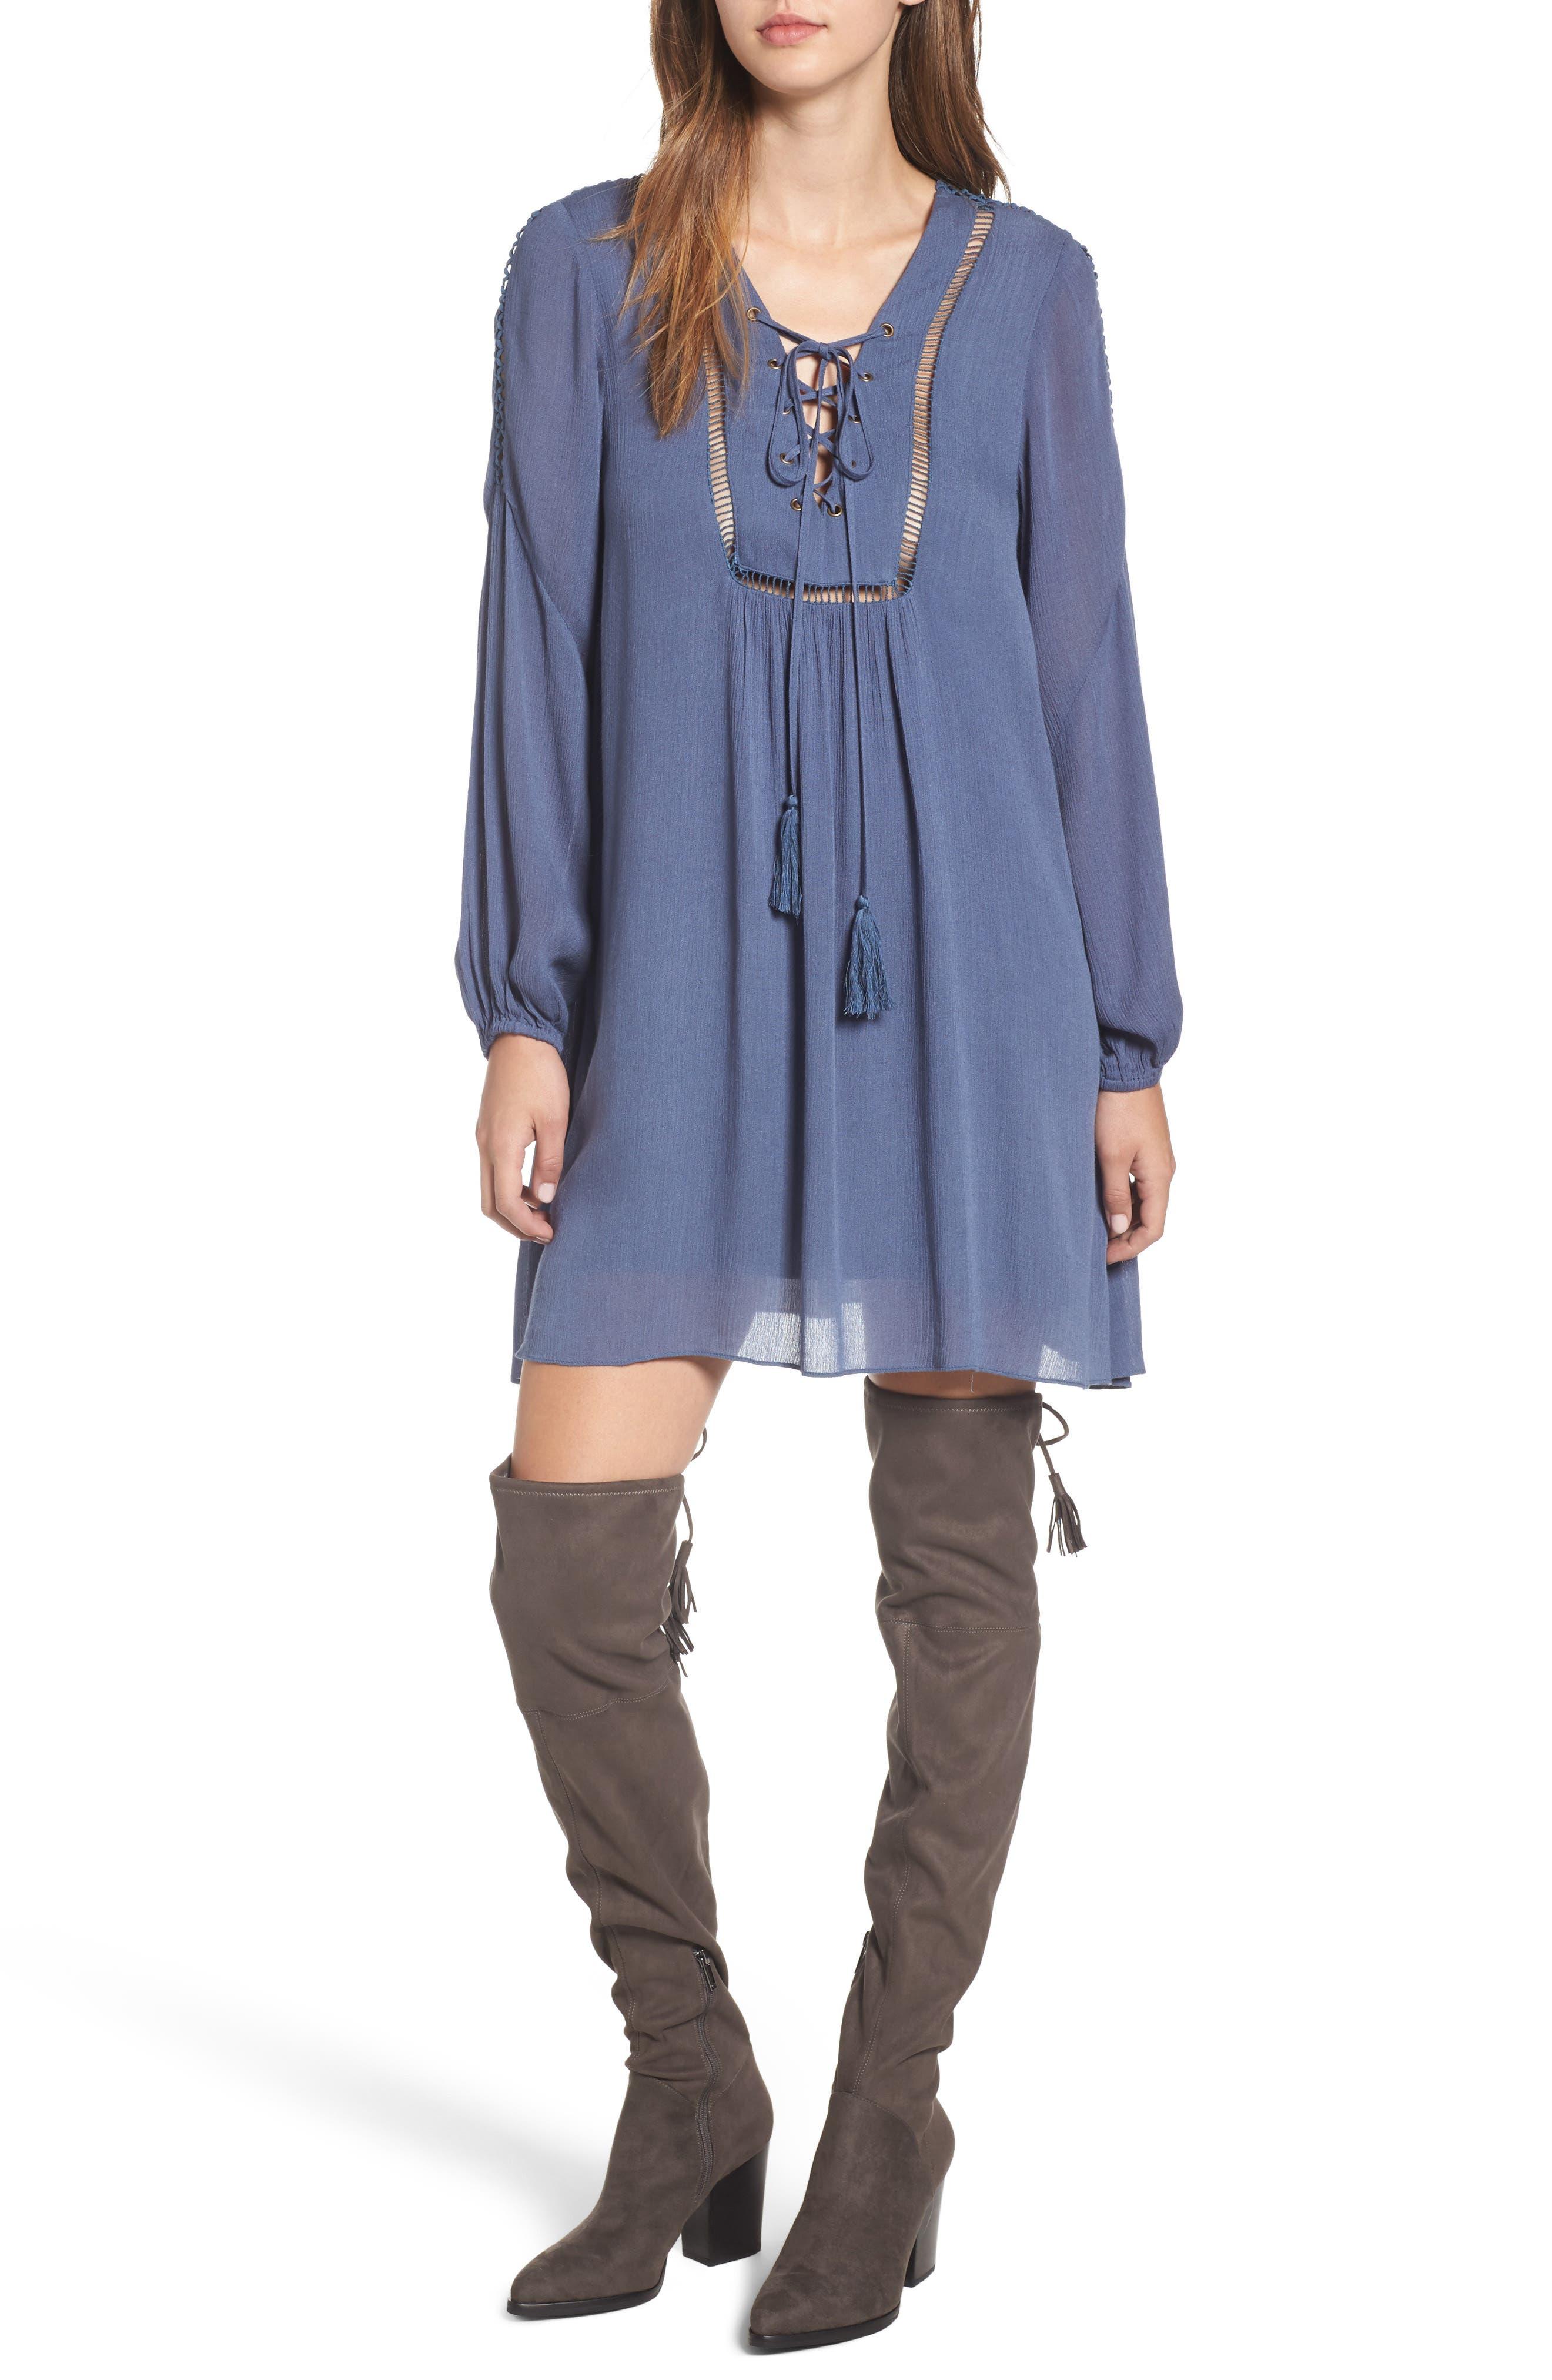 Alternate Image 1 Selected - Lost + Wander Julia Lace-Up Swing Dress